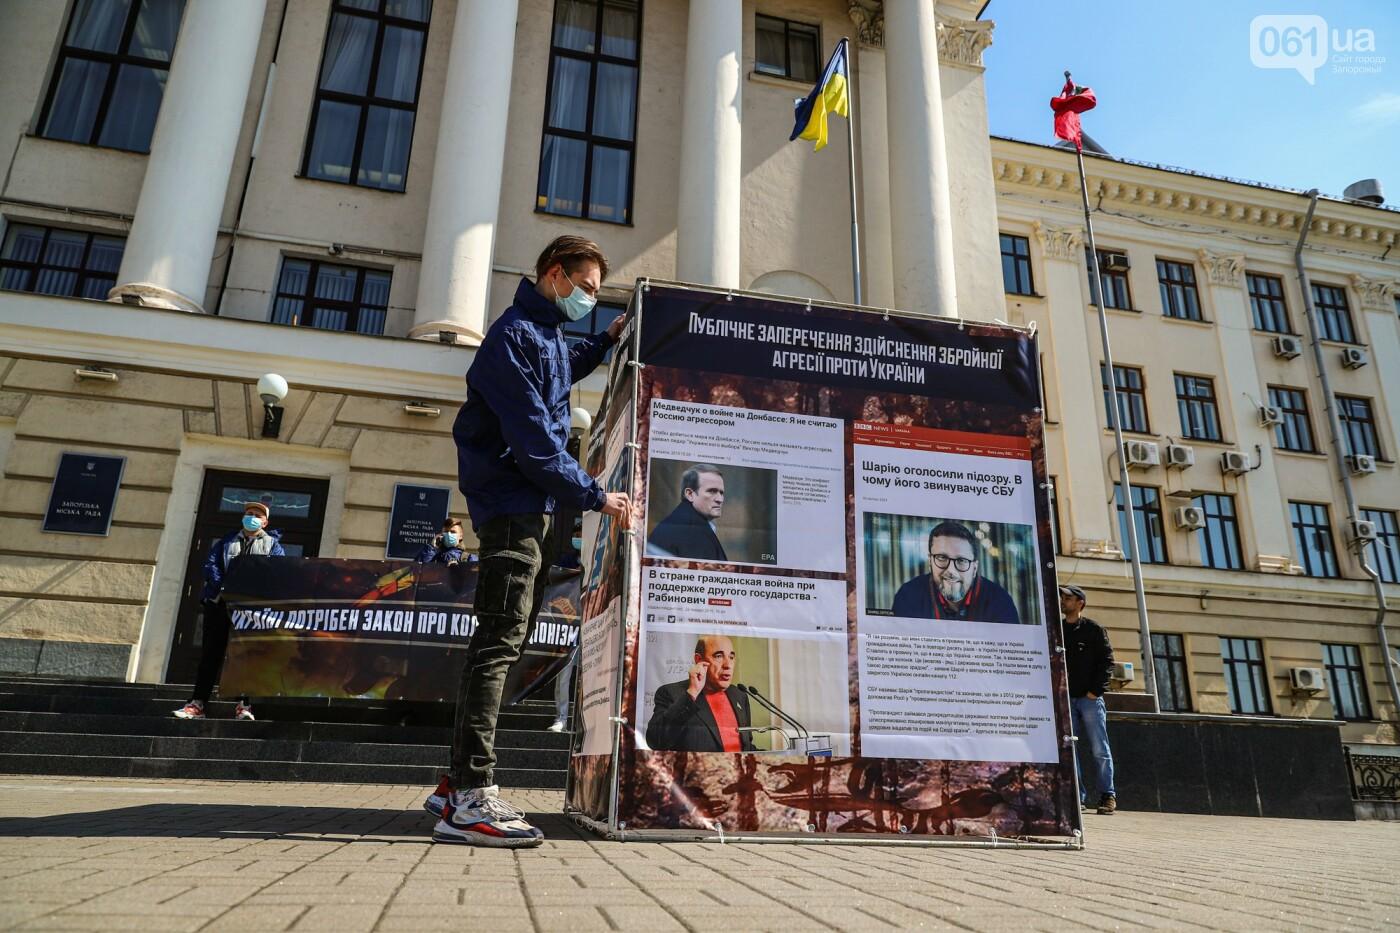 В Запорожье возле мэрии установили стенды с портретами Медведчука и Шария, - ФОТО, фото-4